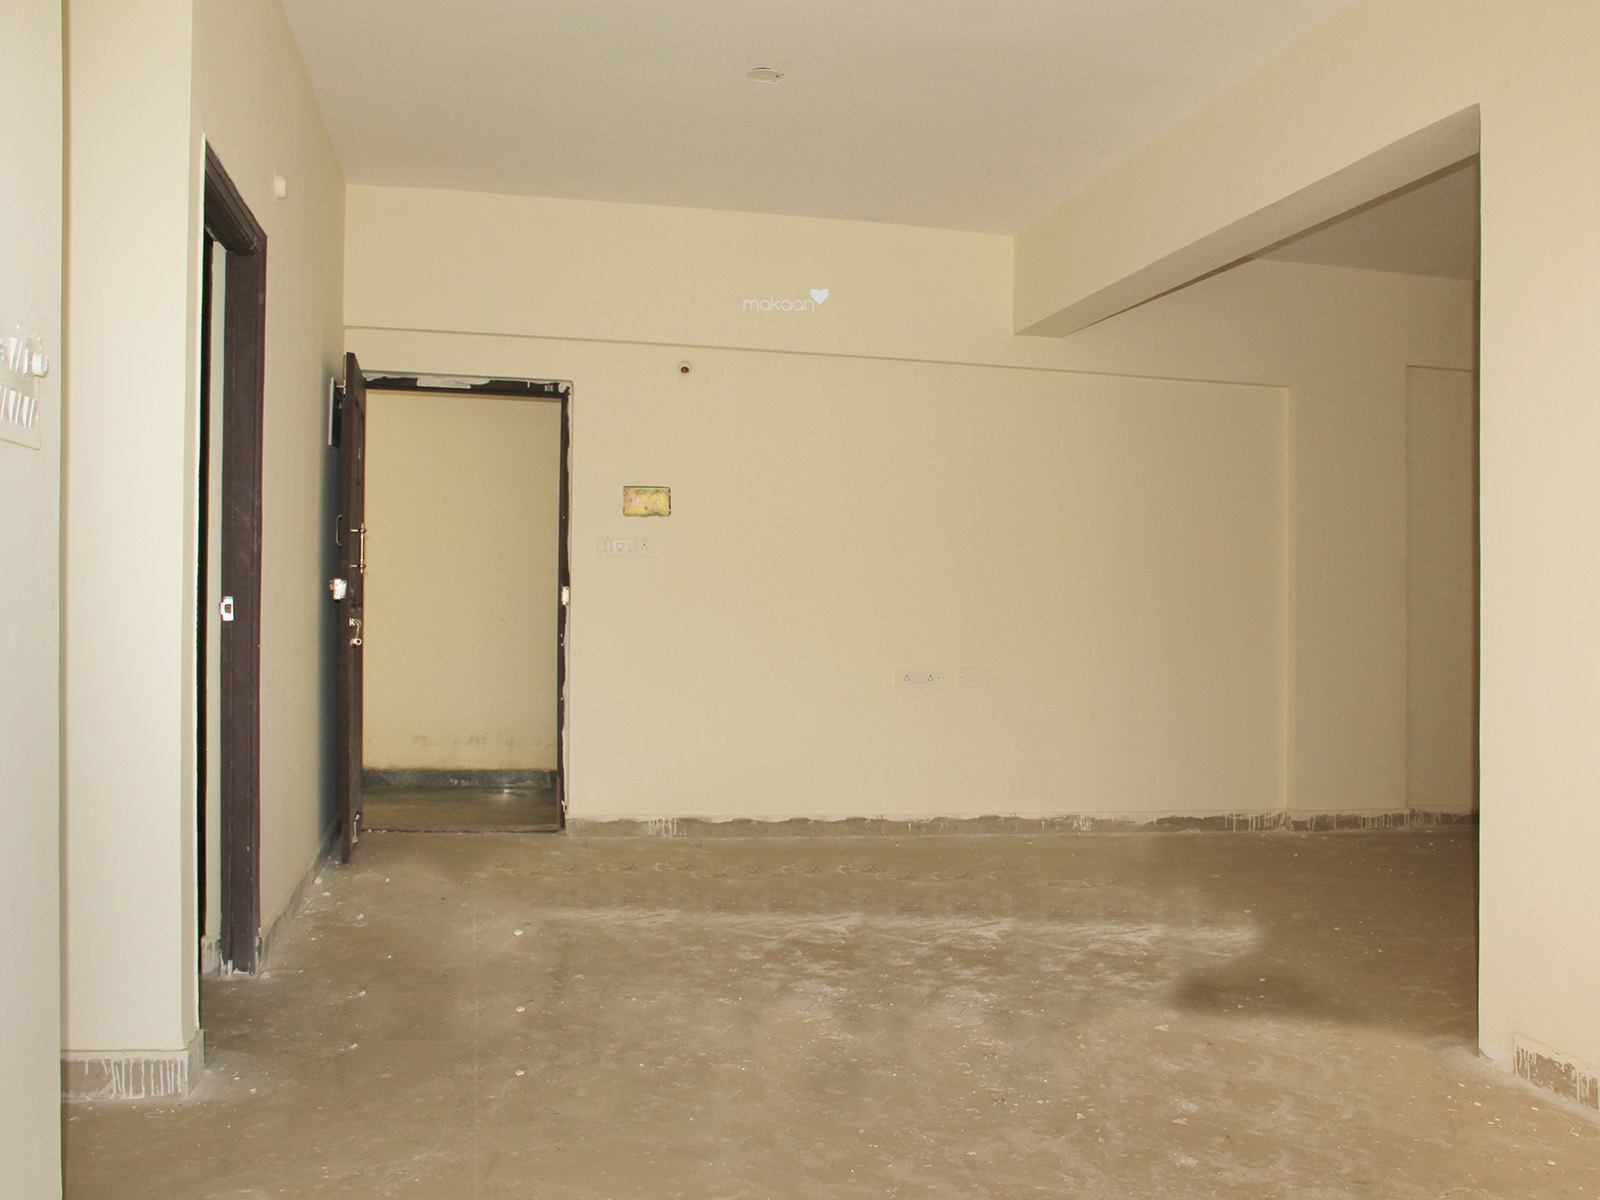 1720 sq ft 3BHK 3BHK+3T (1,720 sq ft) Property By Proptiger In Aakruthi Homes, Mahadevapura